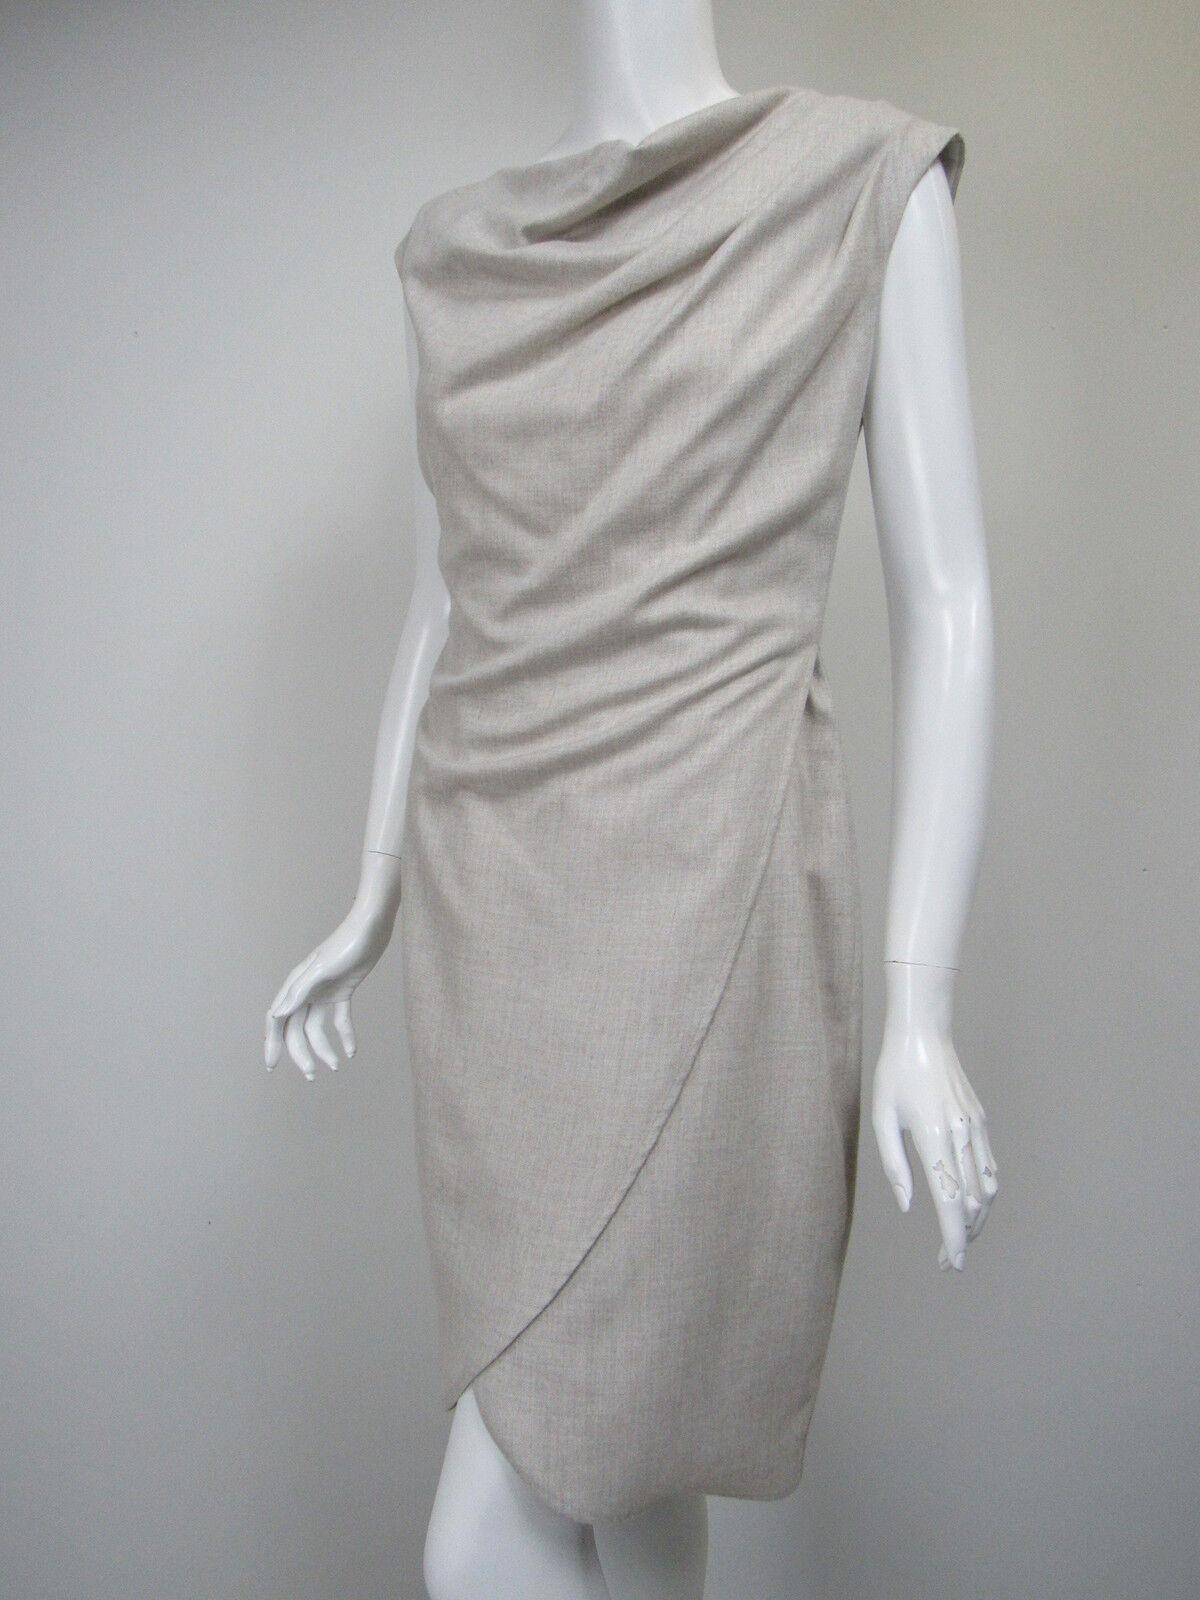 IRIS SETLAKWE Light Beige Draped Cowl Neck Cutaway Skirt Sheath Dress sz 4